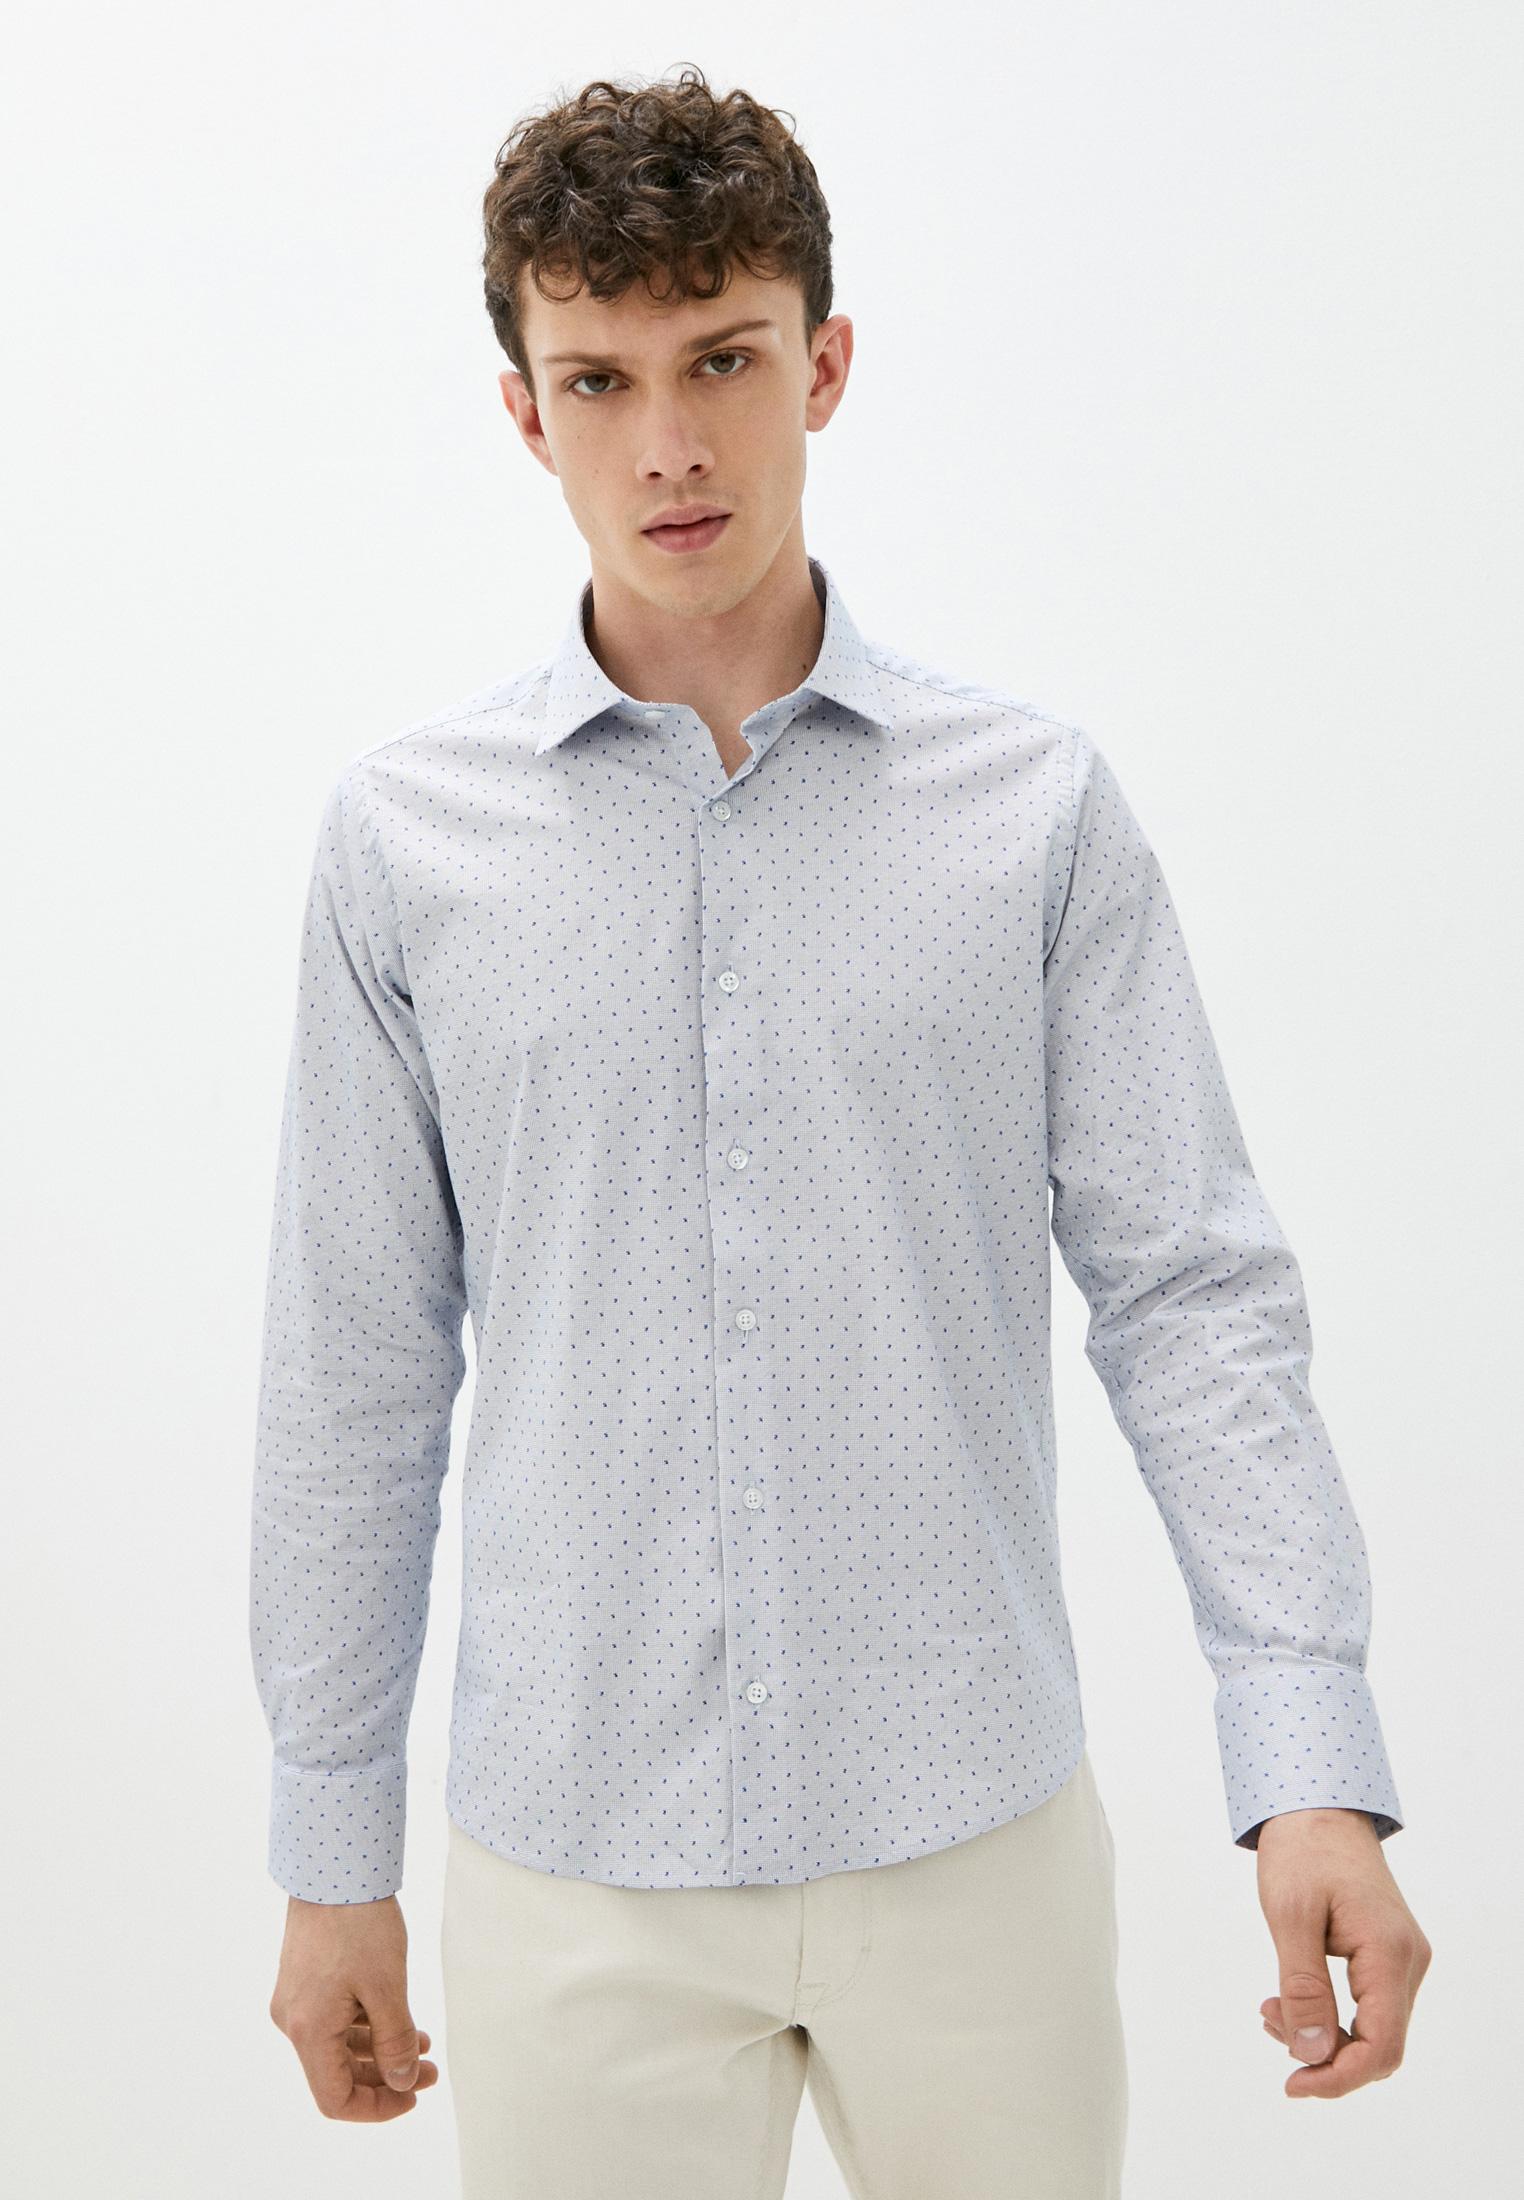 Рубашка с длинным рукавом GIORGIO DI MARE GI475863